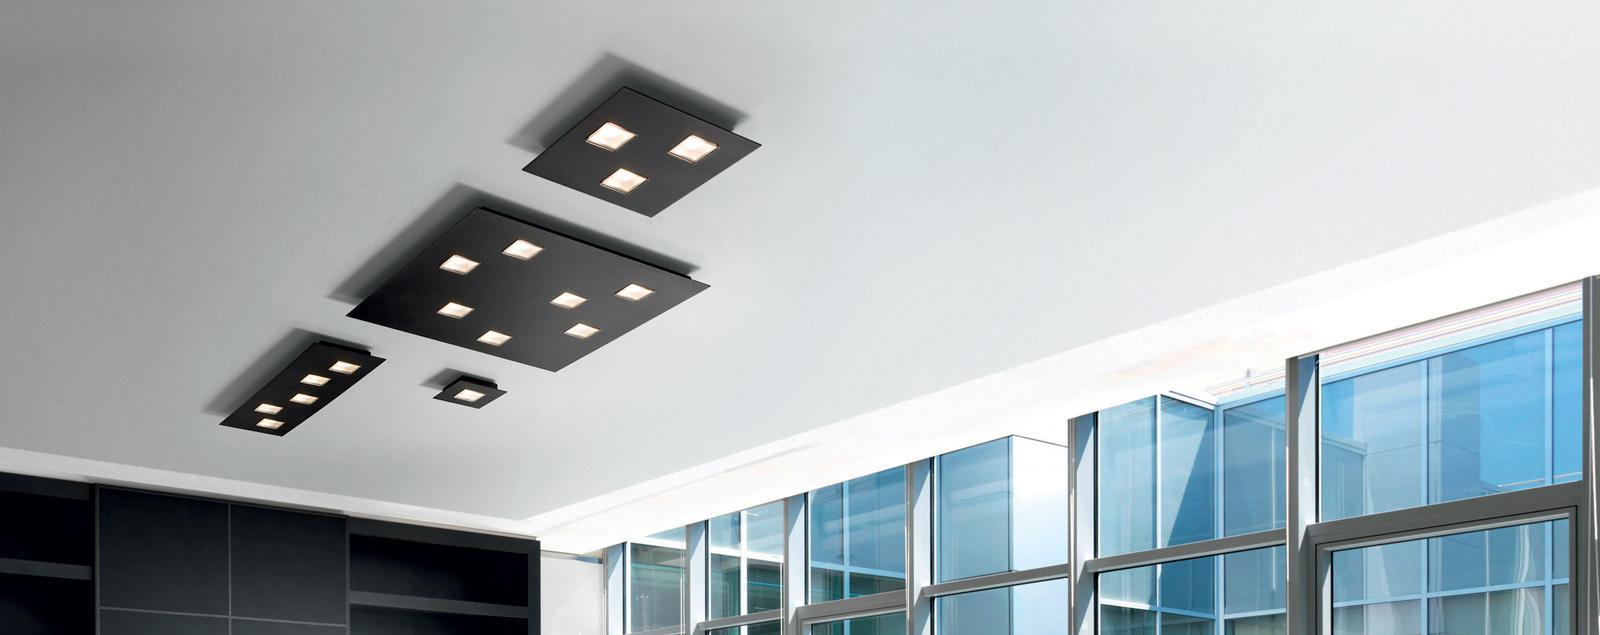 F38 Quarter wall and ceiling lamp - Fabbian Illuminazione